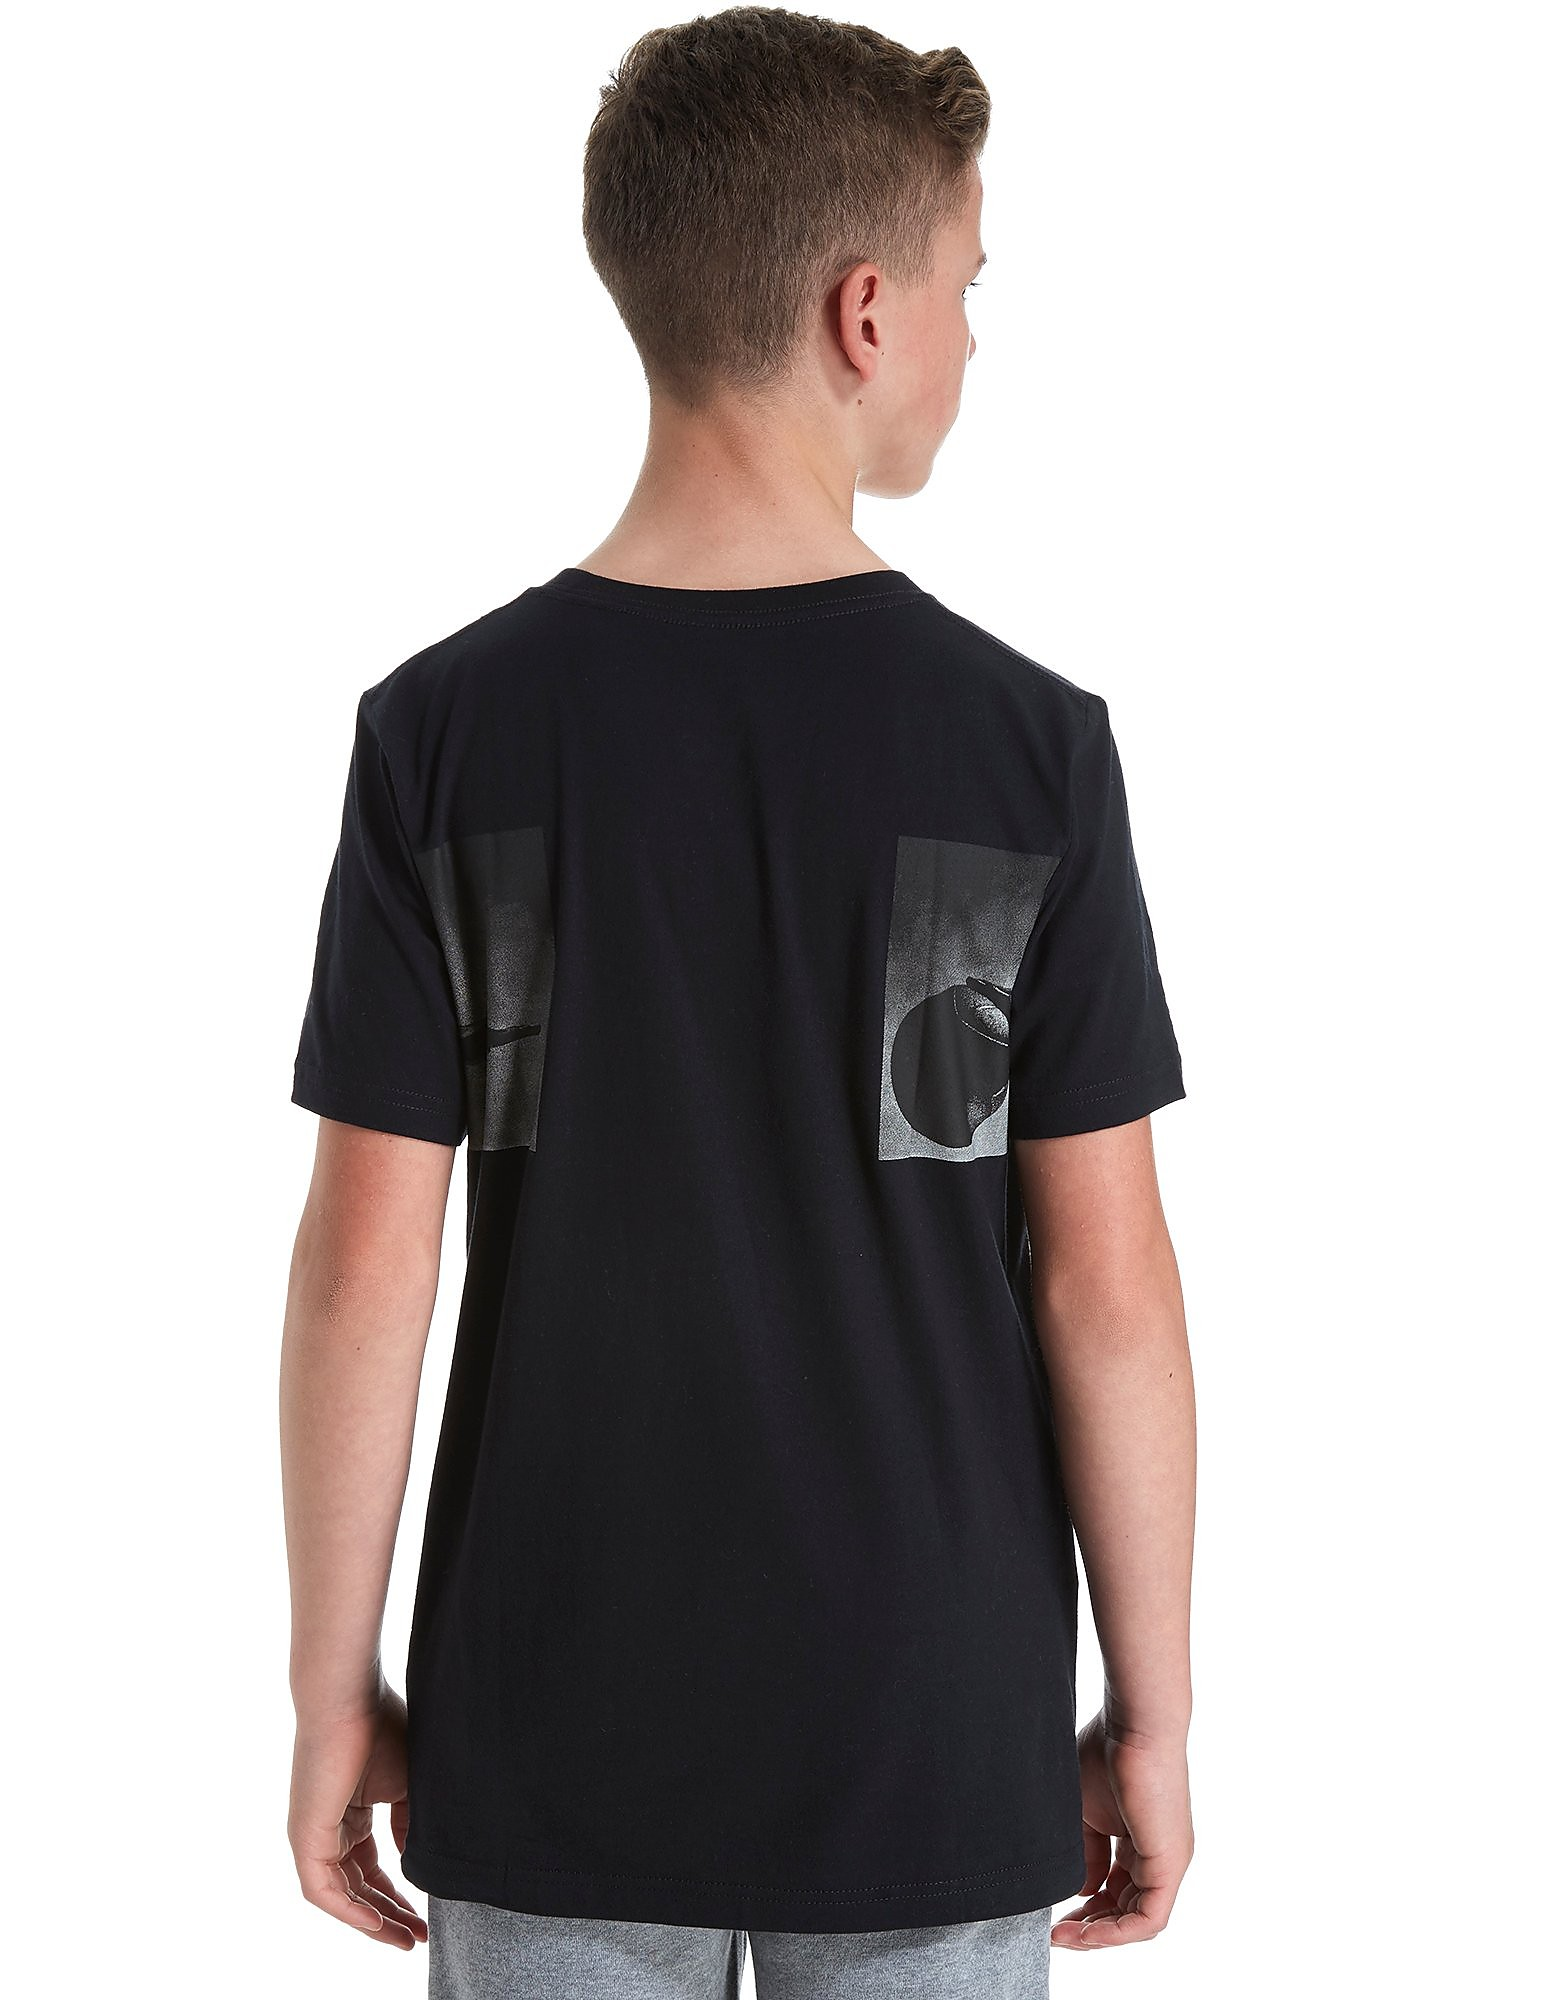 Jordan Lifestyle Wings Photo T-Shirt Junior